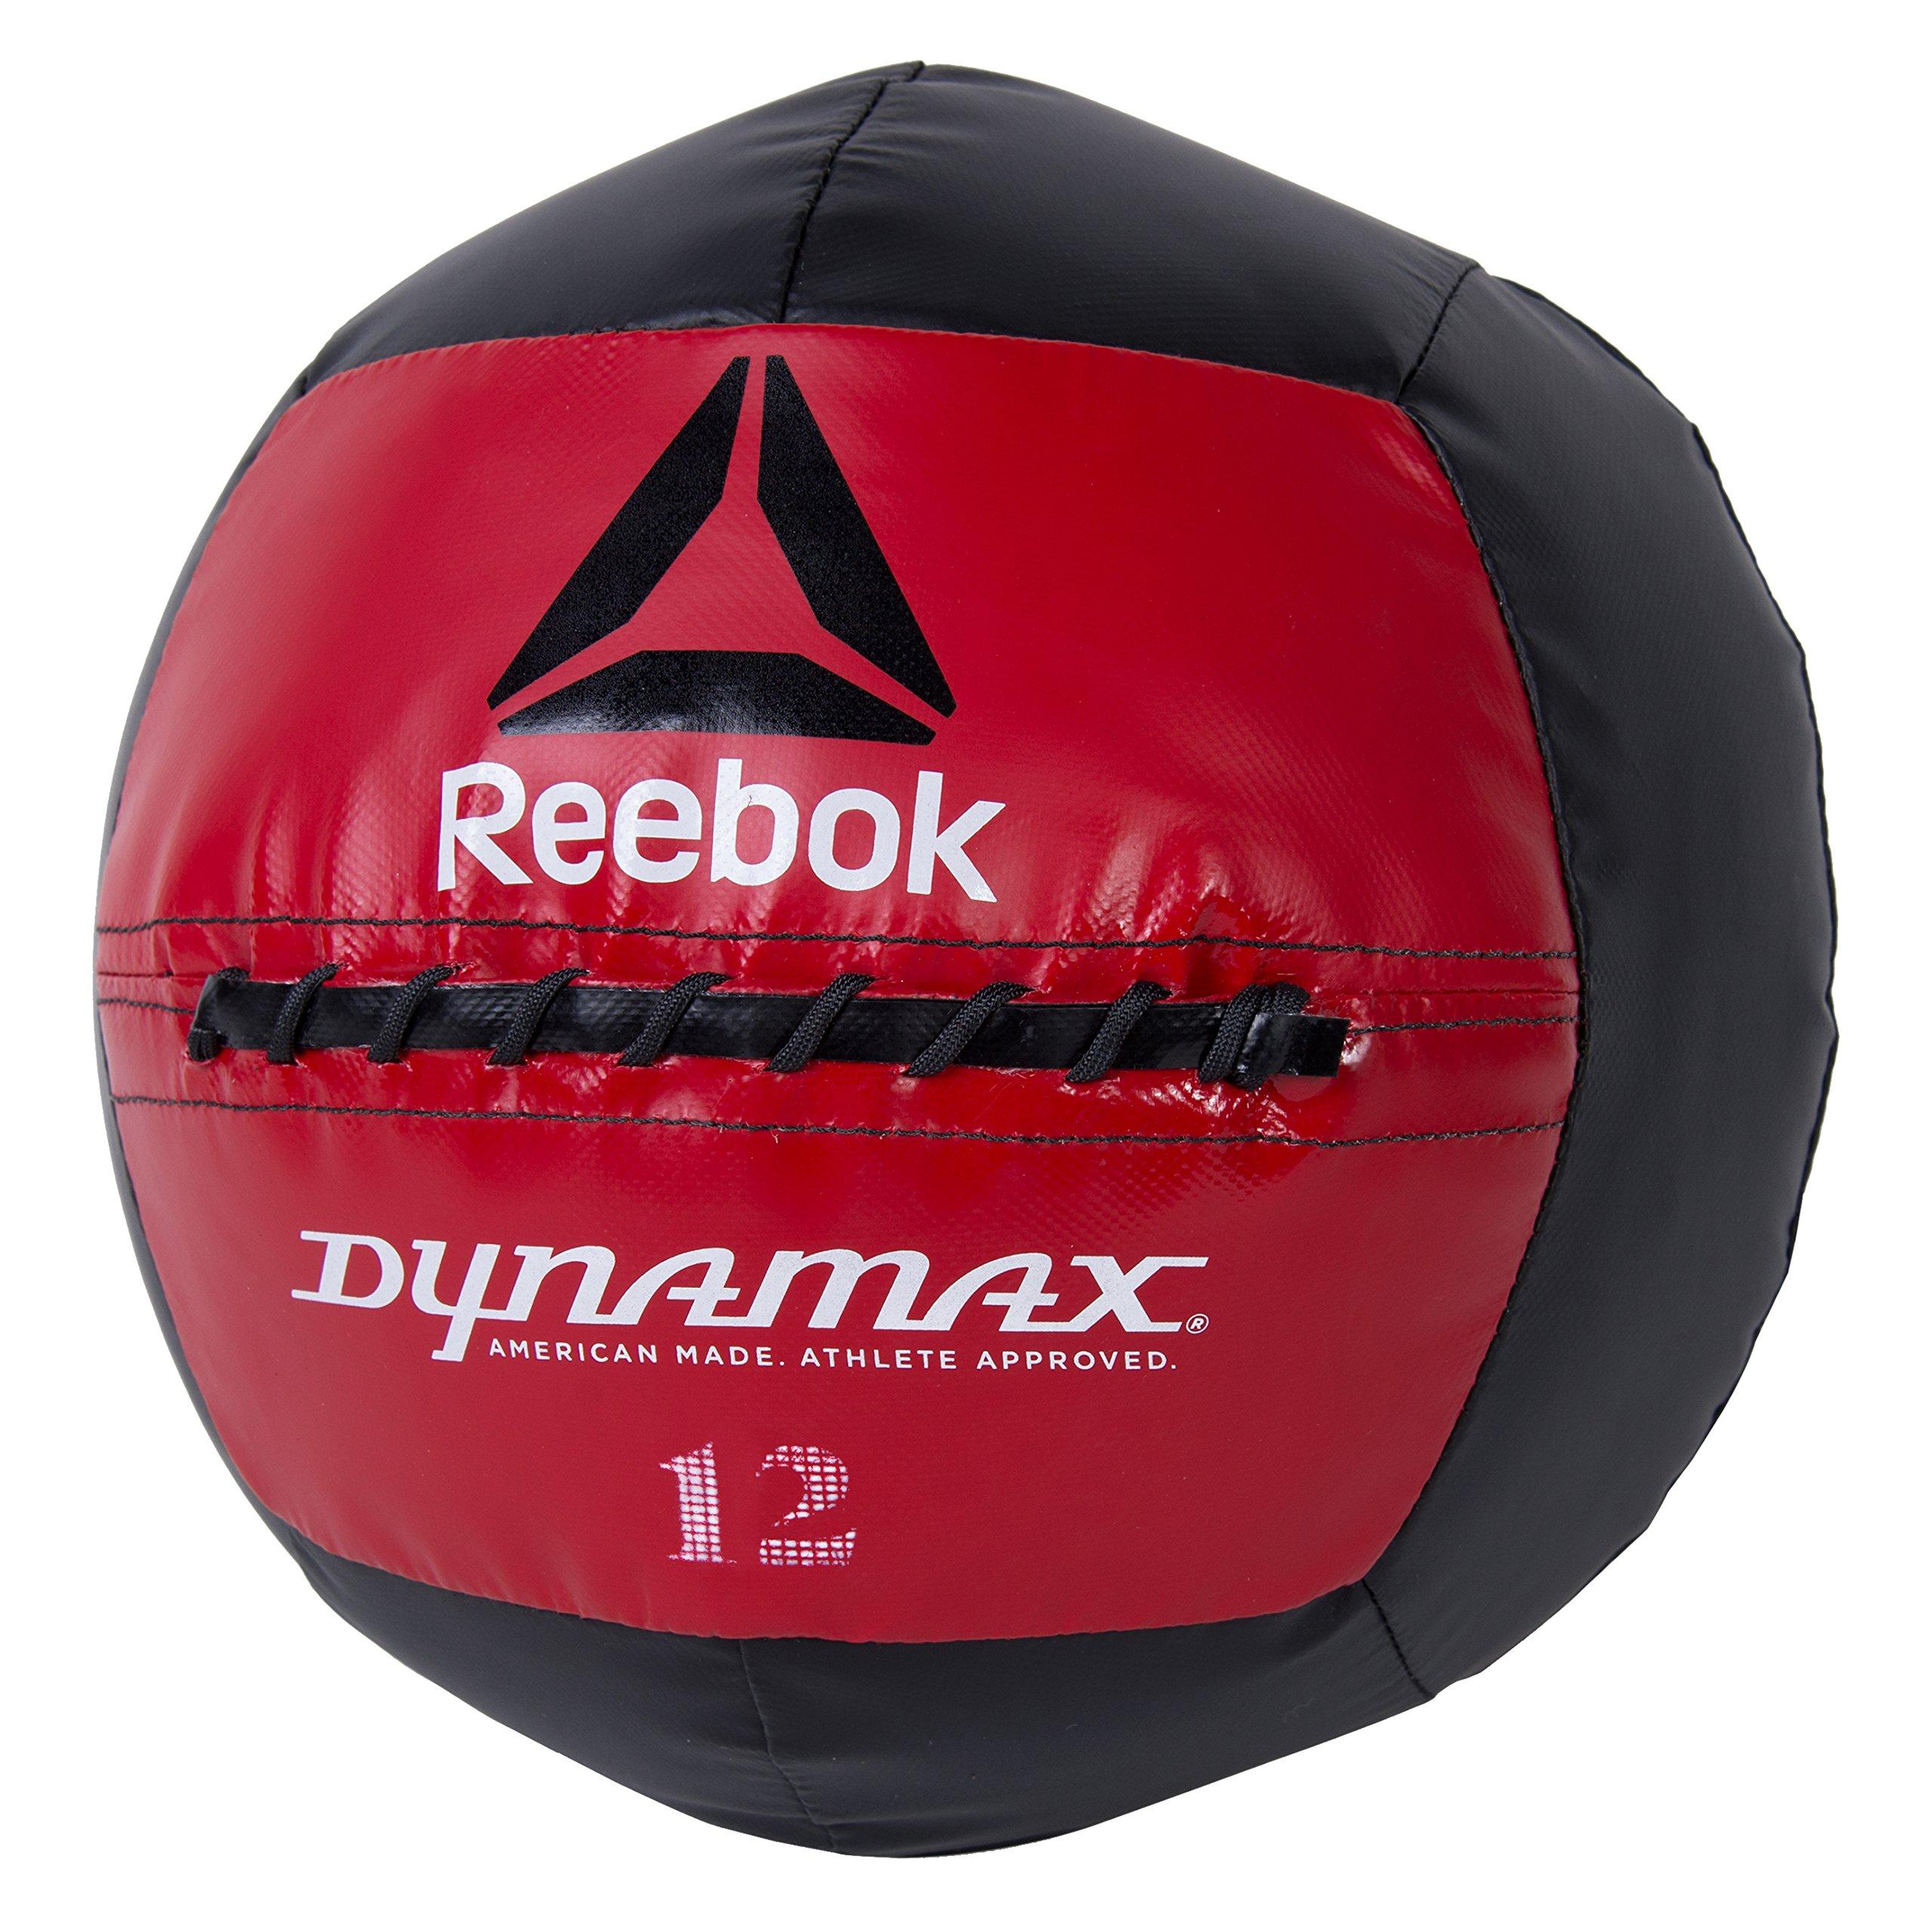 Reebok Soft-Shell Medicine Ball by Dynamax, 12 lbs